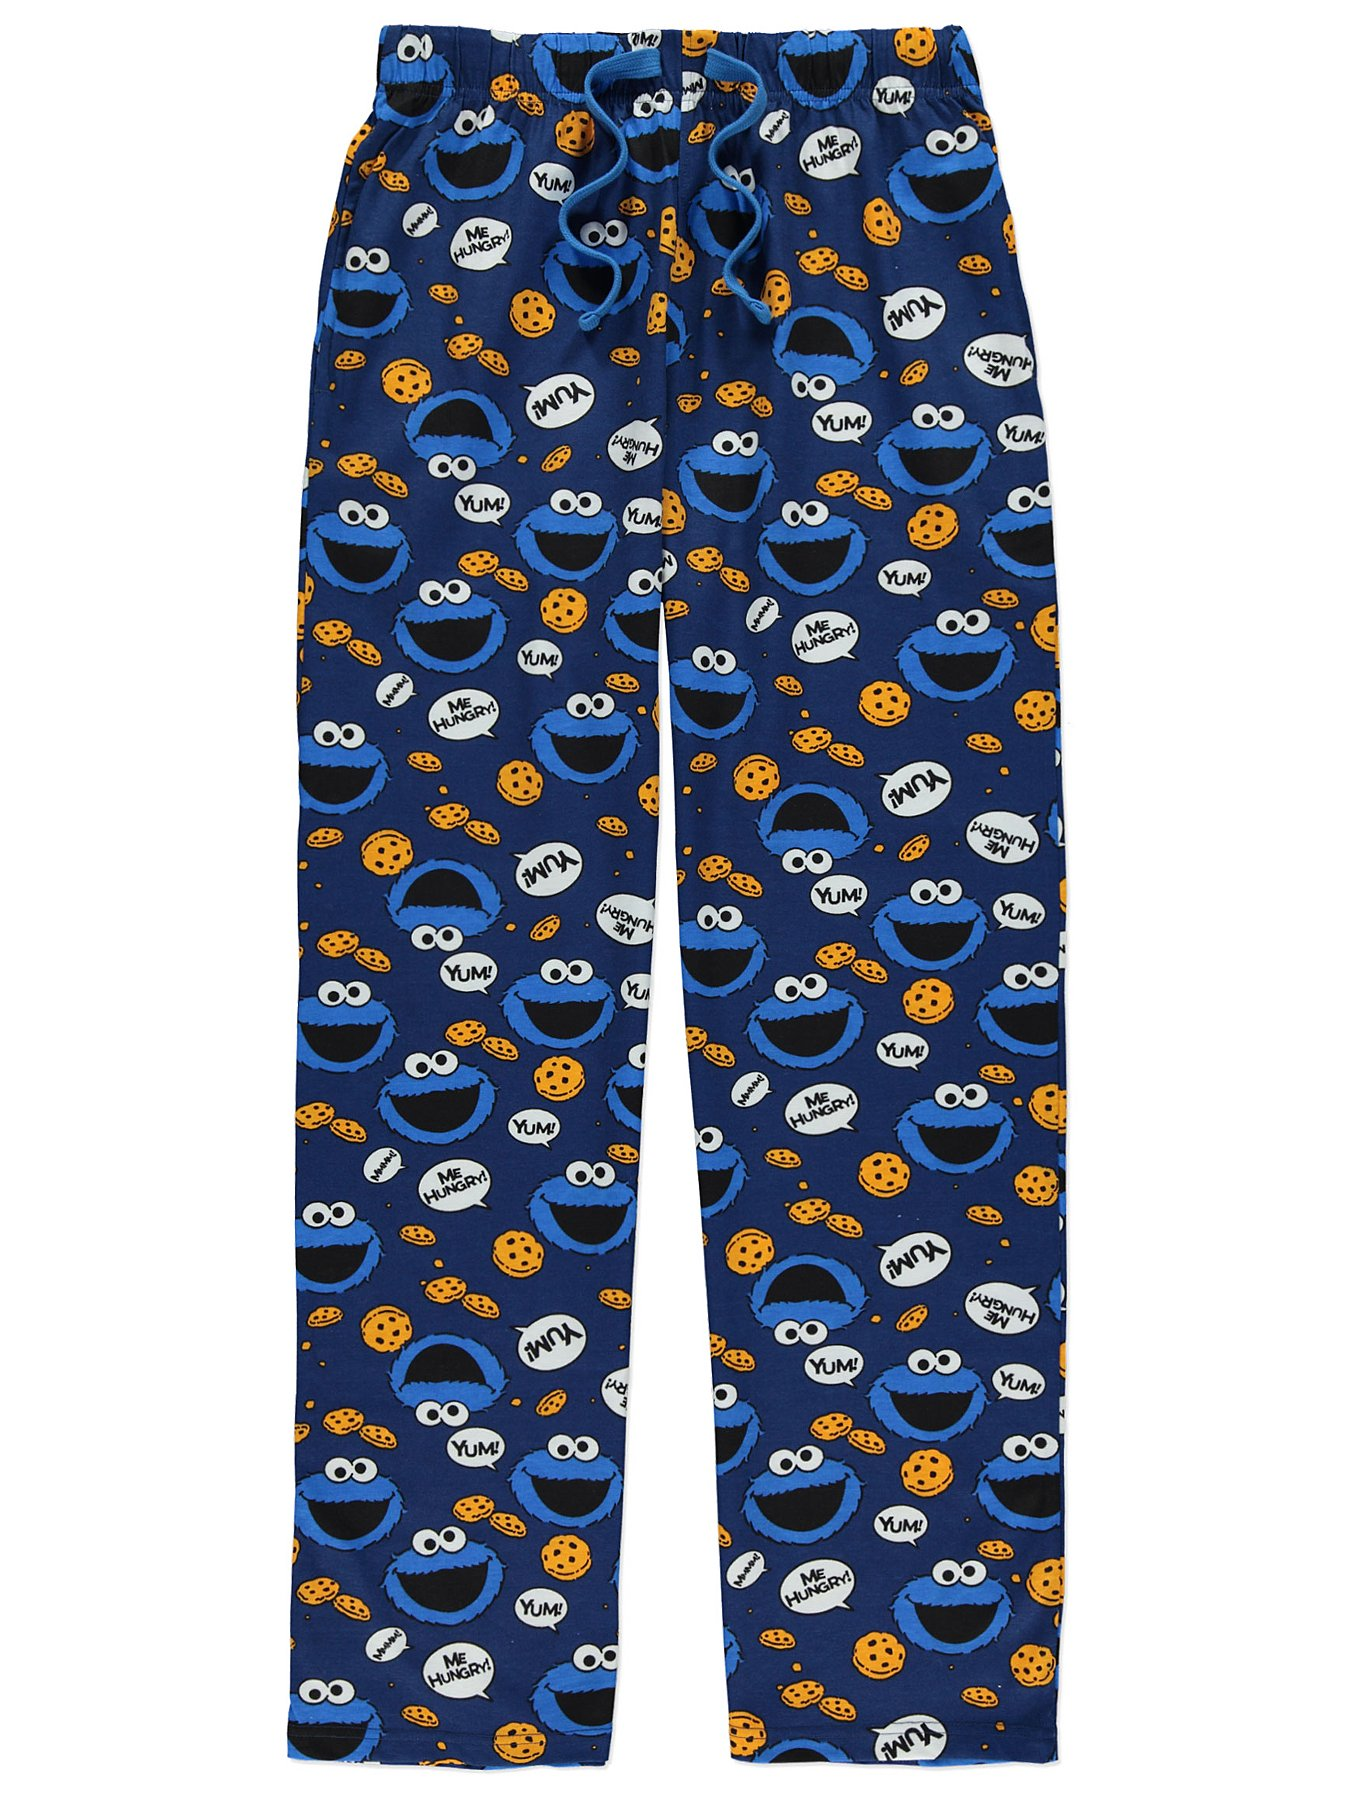 Sesame Street Mens Character Pajama Sleep Pants